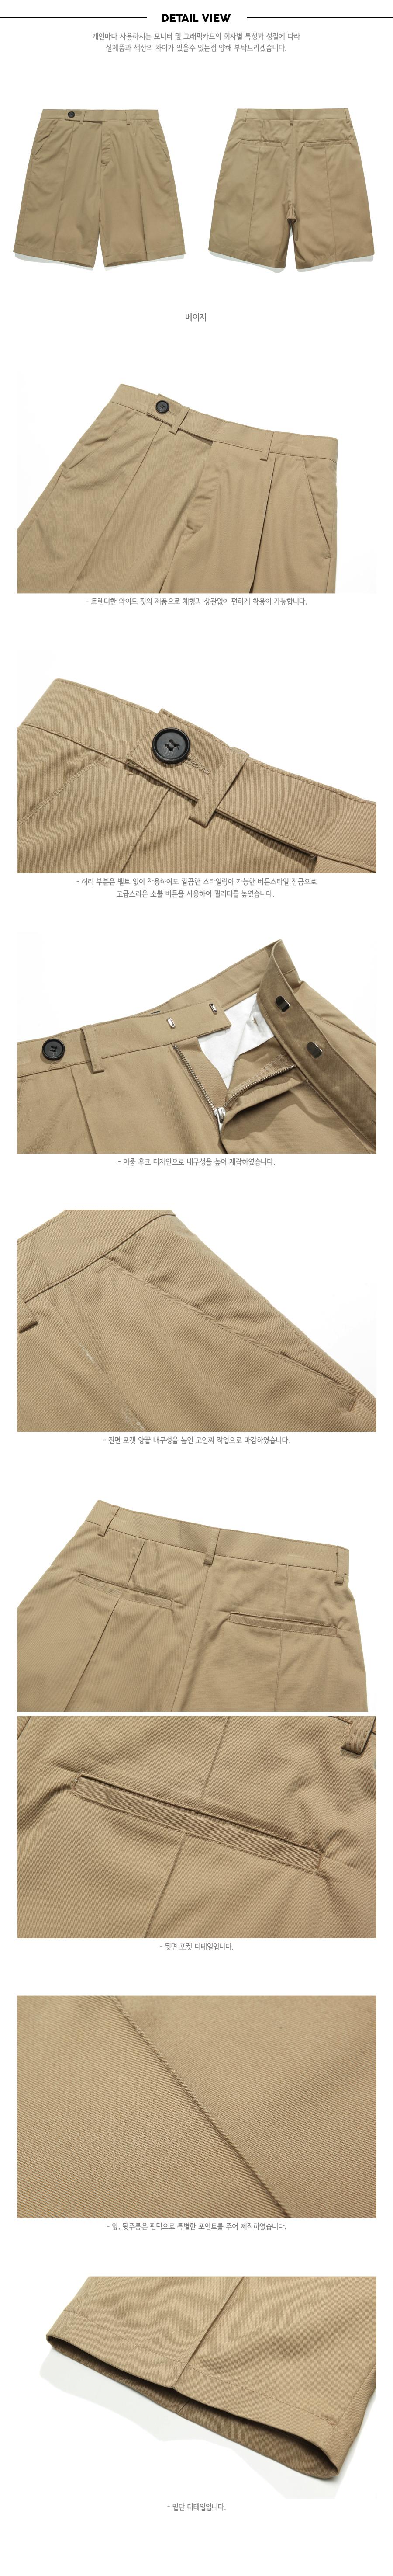 20190325_tencel_short_pants_detail_beige_kj.jpg